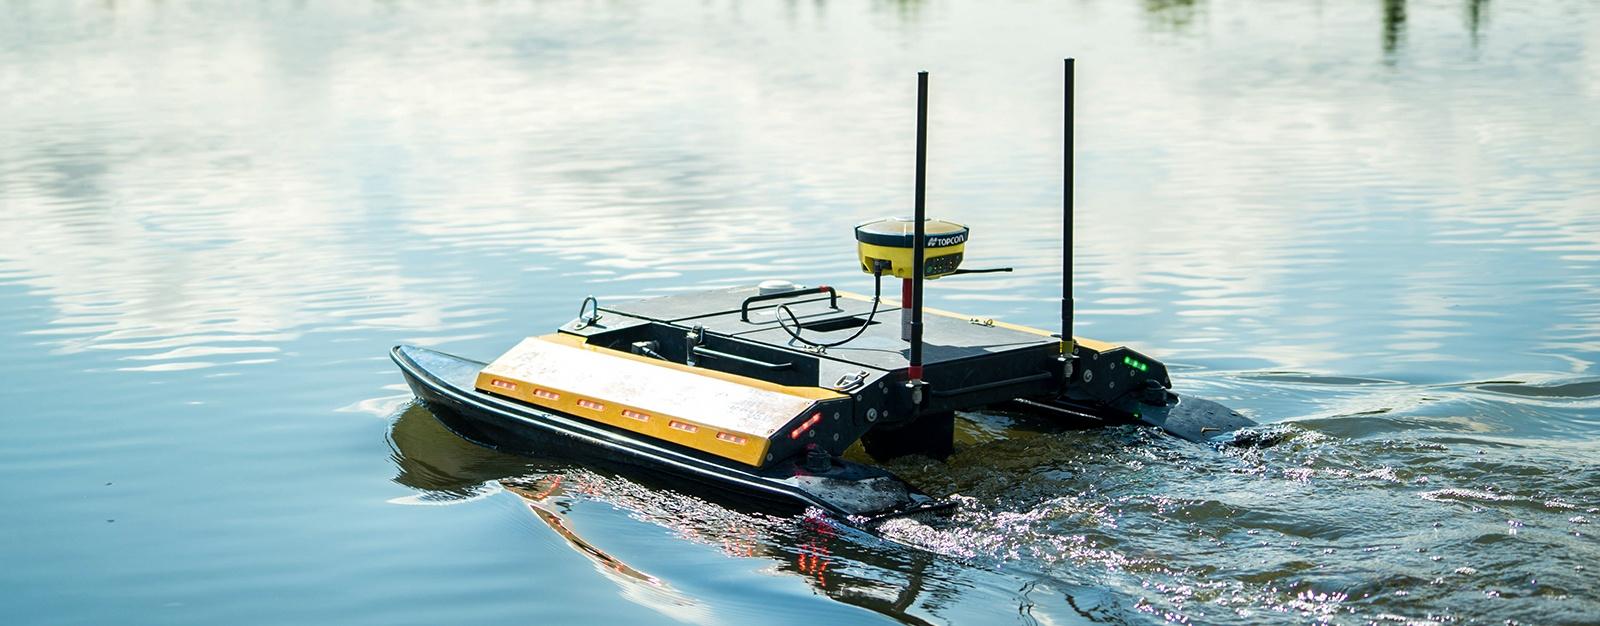 Network brings 'life' to bathymetric survey boat | Topcon